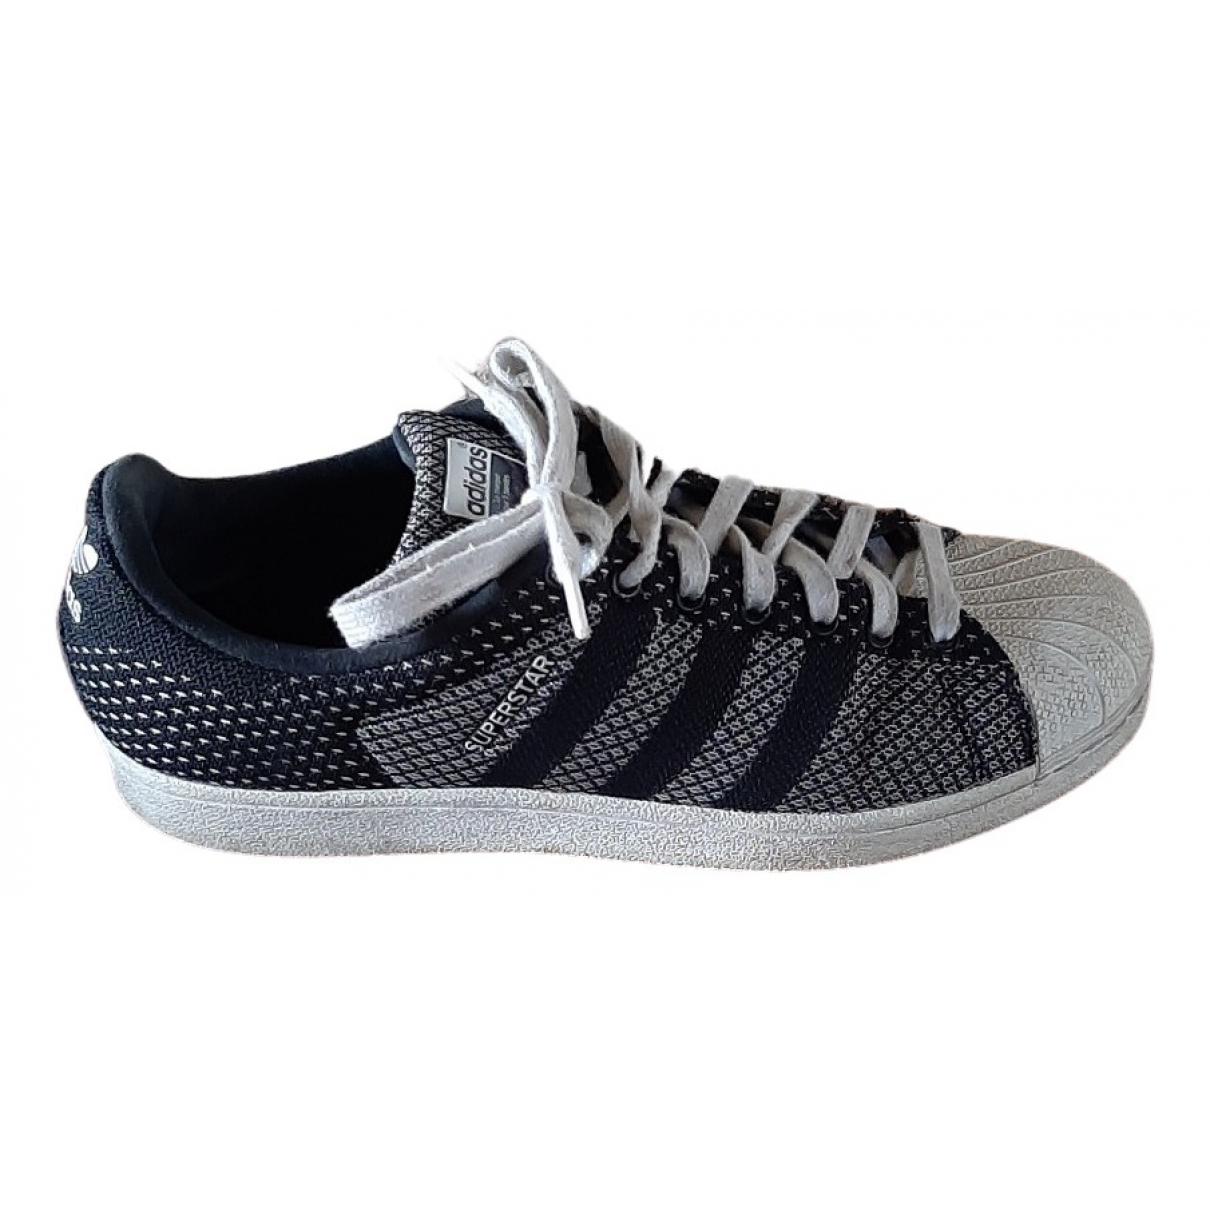 Adidas Superstar Sneakers in  Schwarz Leinen